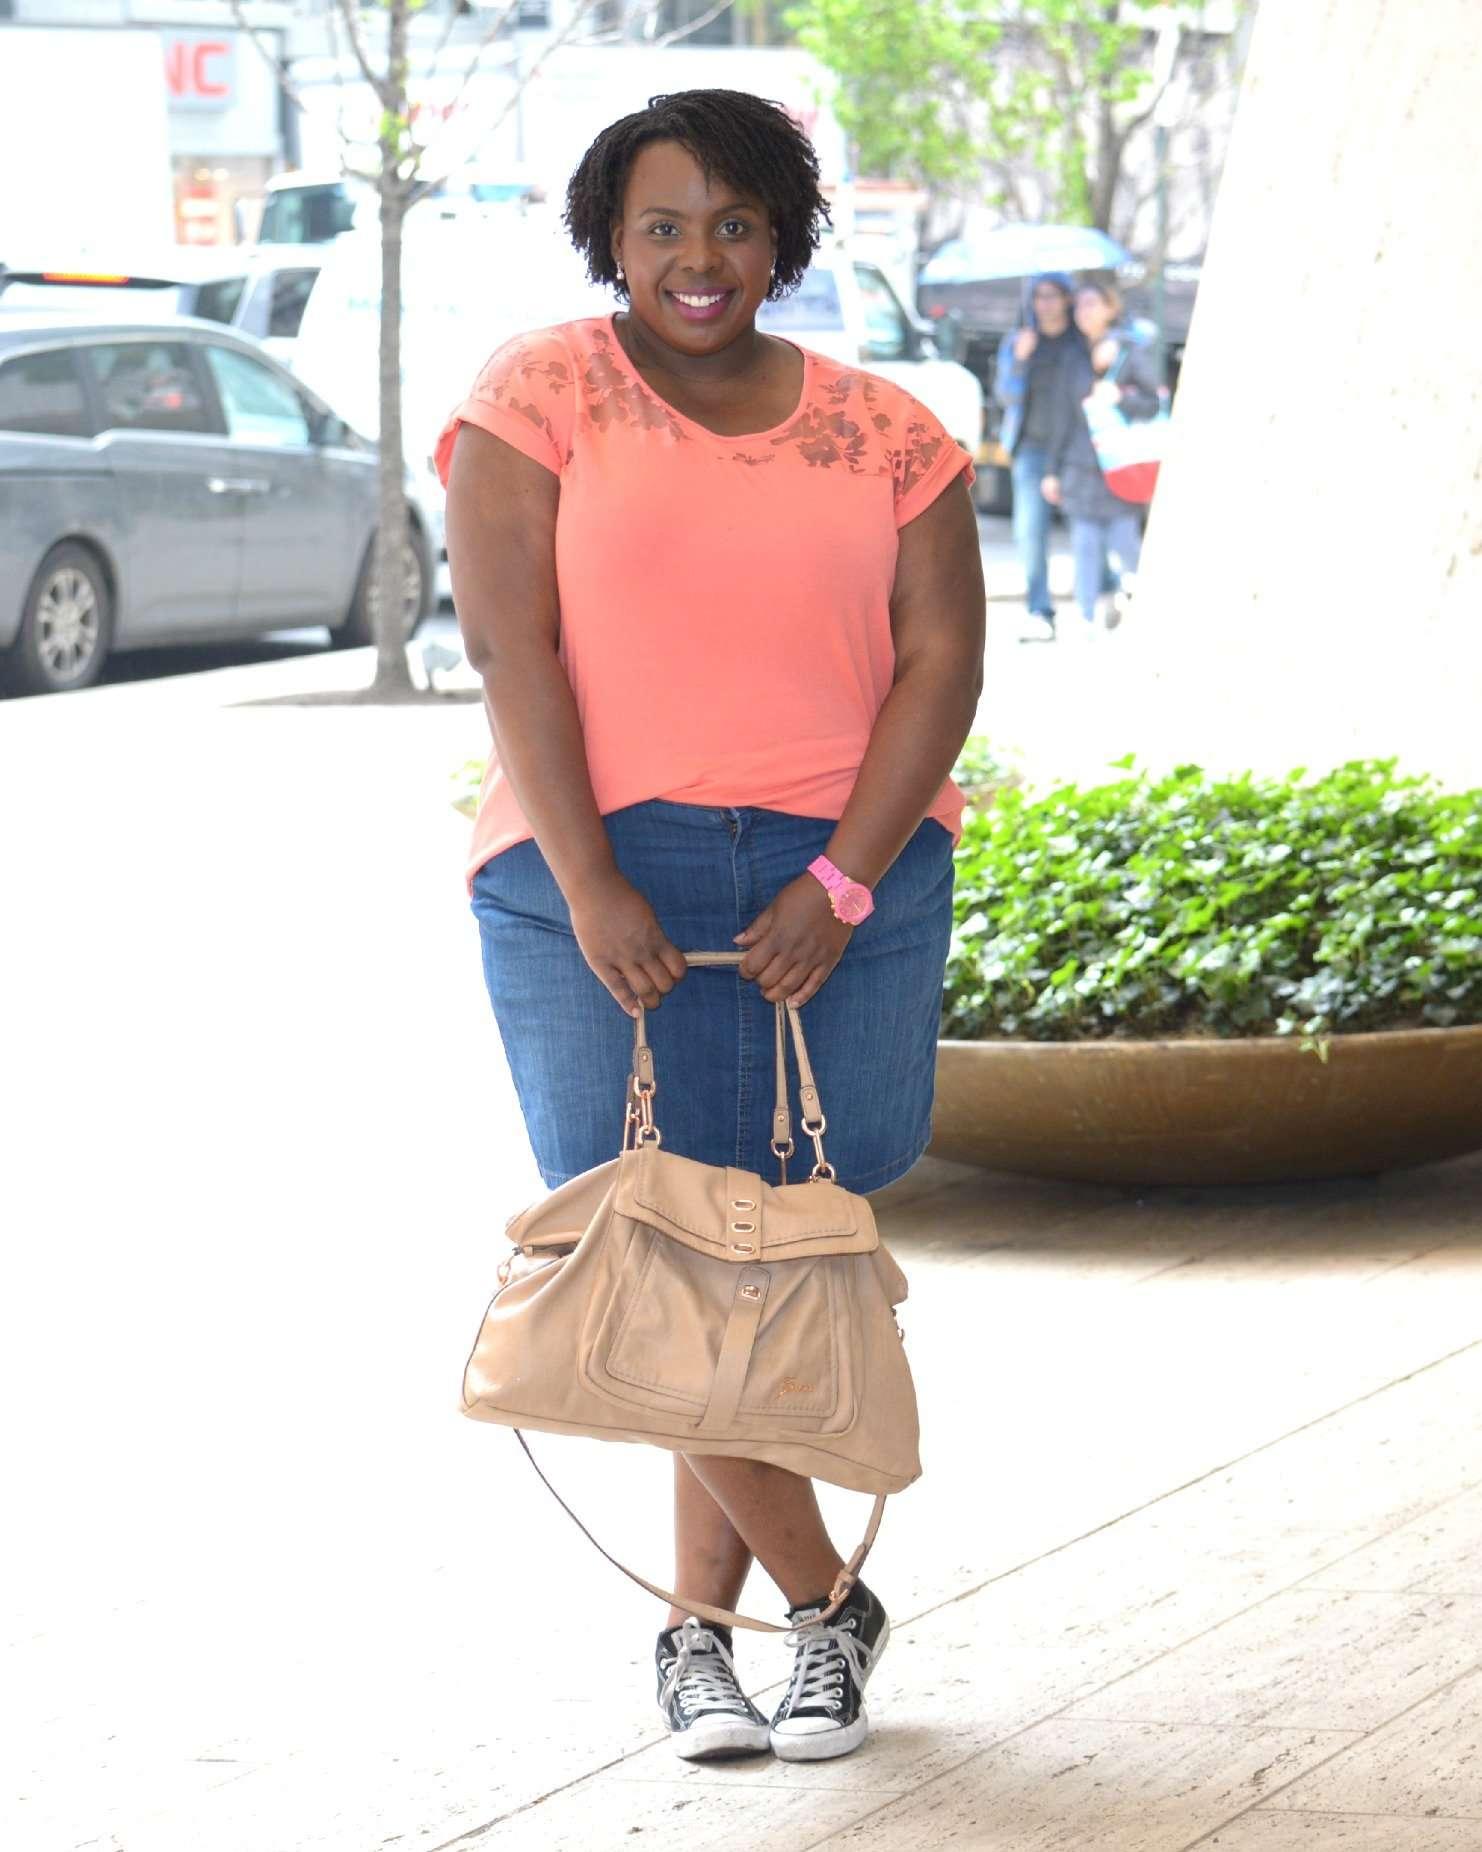 068e34ee3 Plus Size Summer Essentials: a Denim Skirt - CeCe Olisa